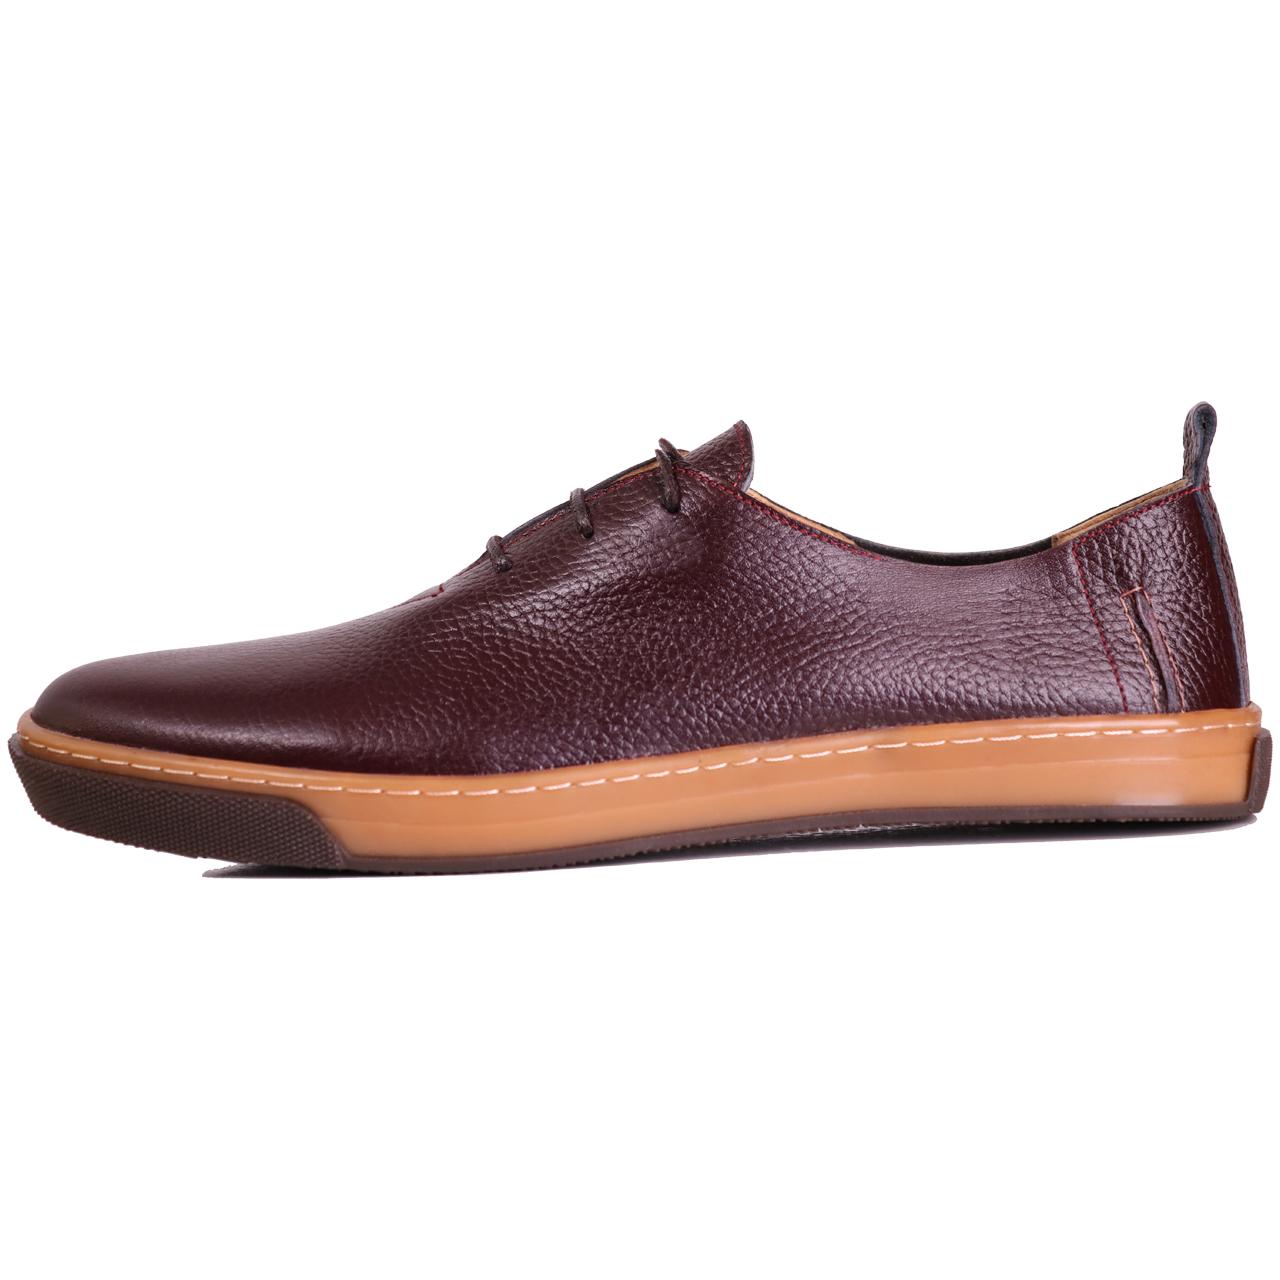 کفش مردانه چرم طبیعی ژاو مدل 1162